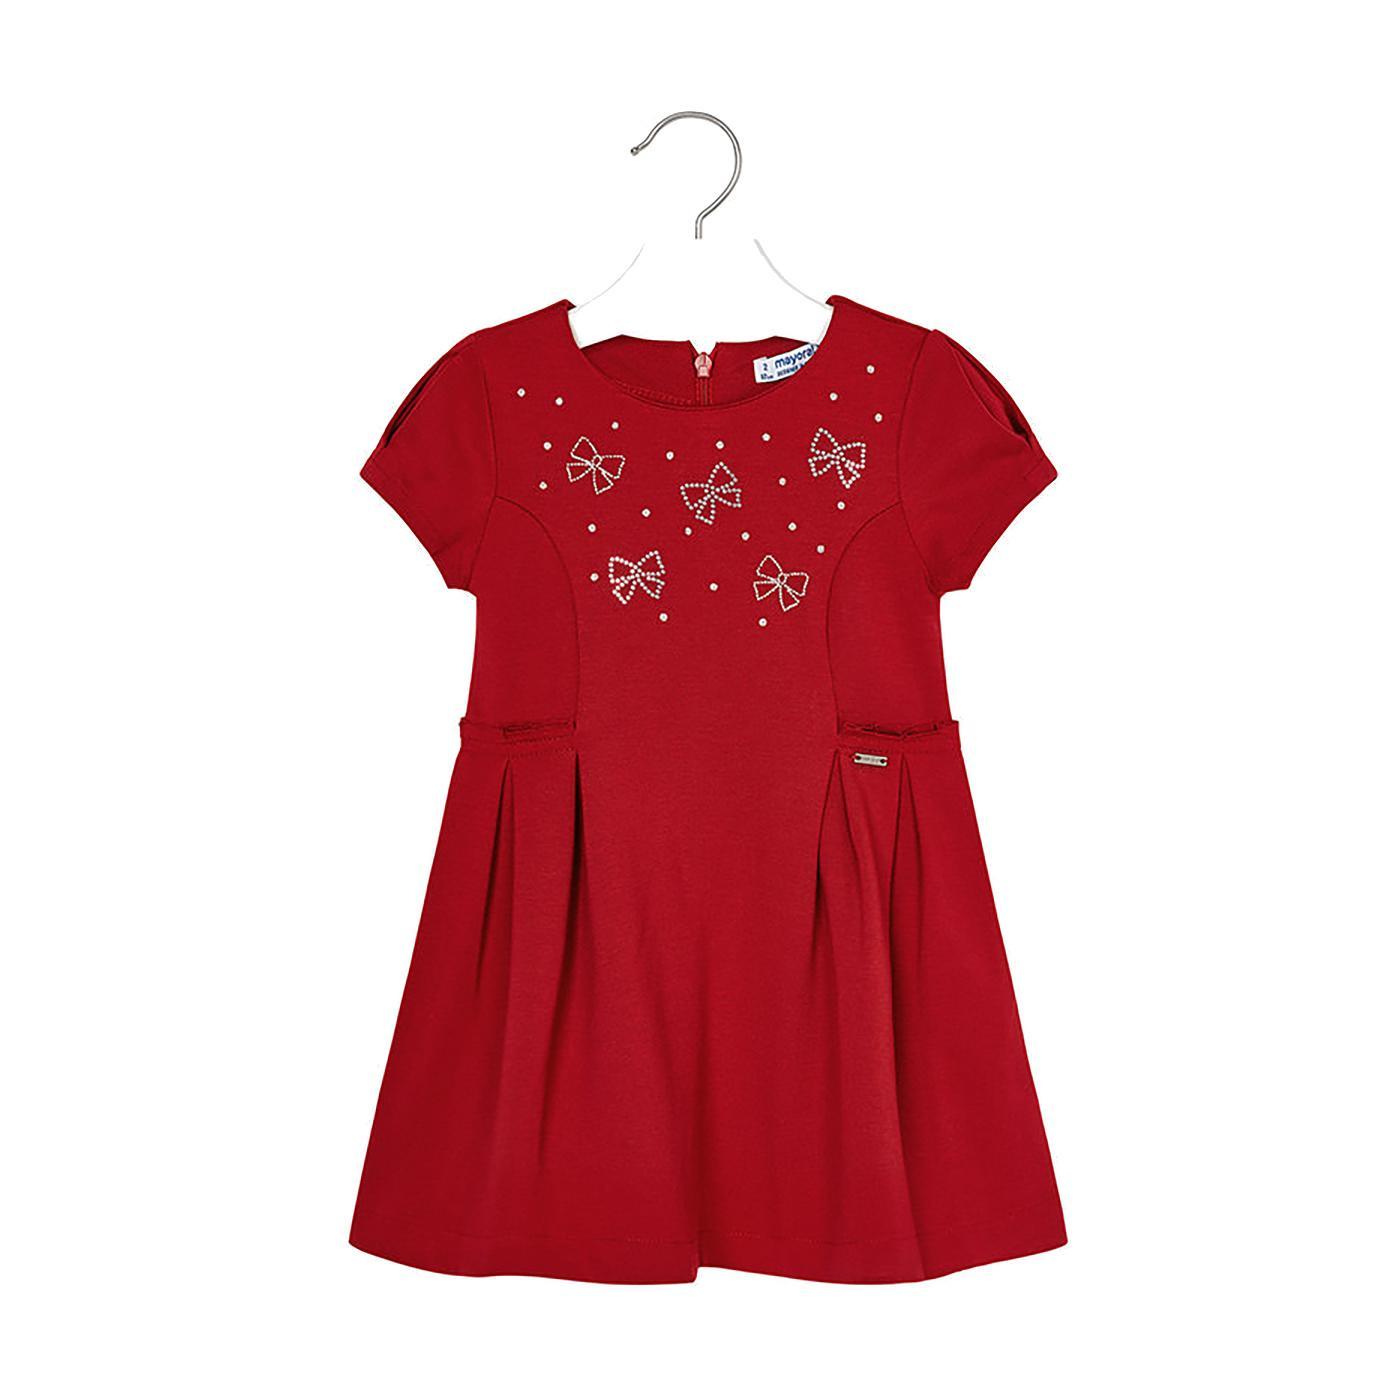 19fe4a7a3 Vestido Jacquard Lurex para Menina Crú - Dott — o maior shopping ...